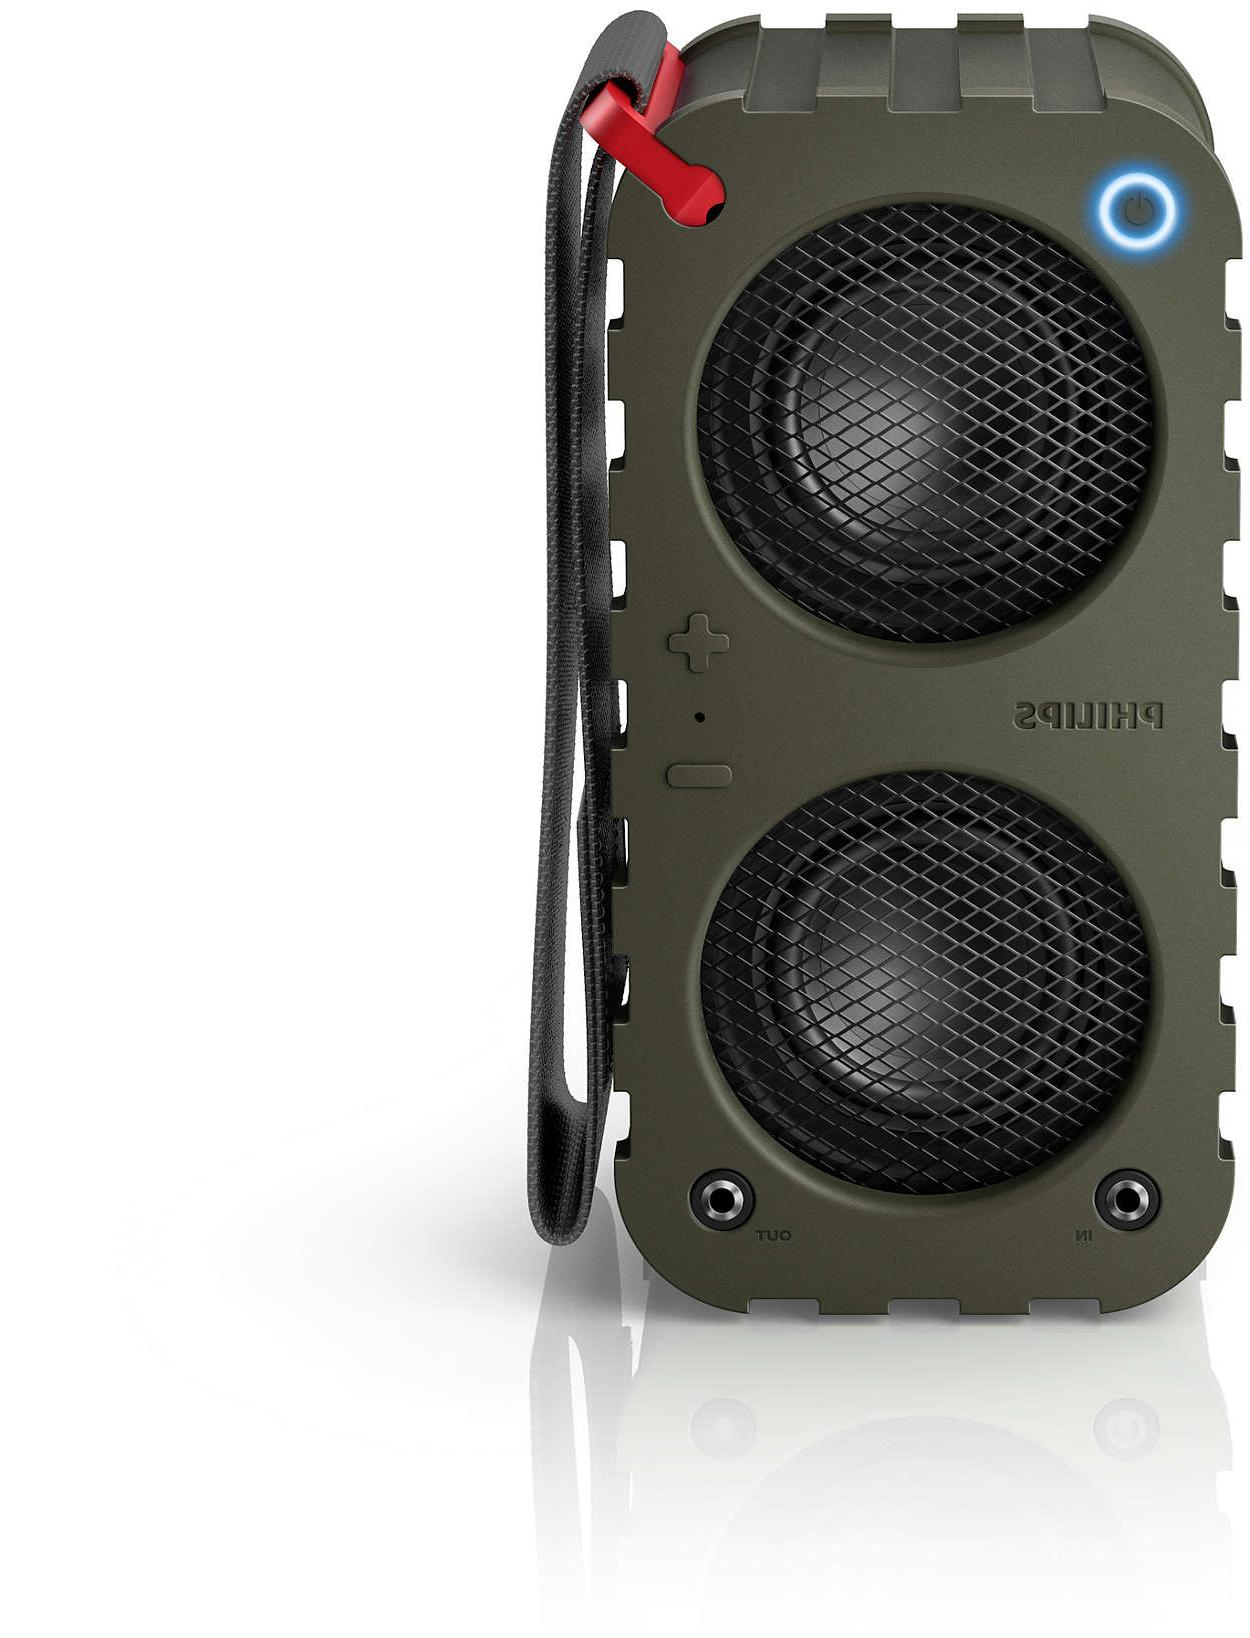 Altavoz Bluetooth Portatil Potente Irdz Altavoz Portà Til Inalà Mbrico Sb5200k 10 Philips